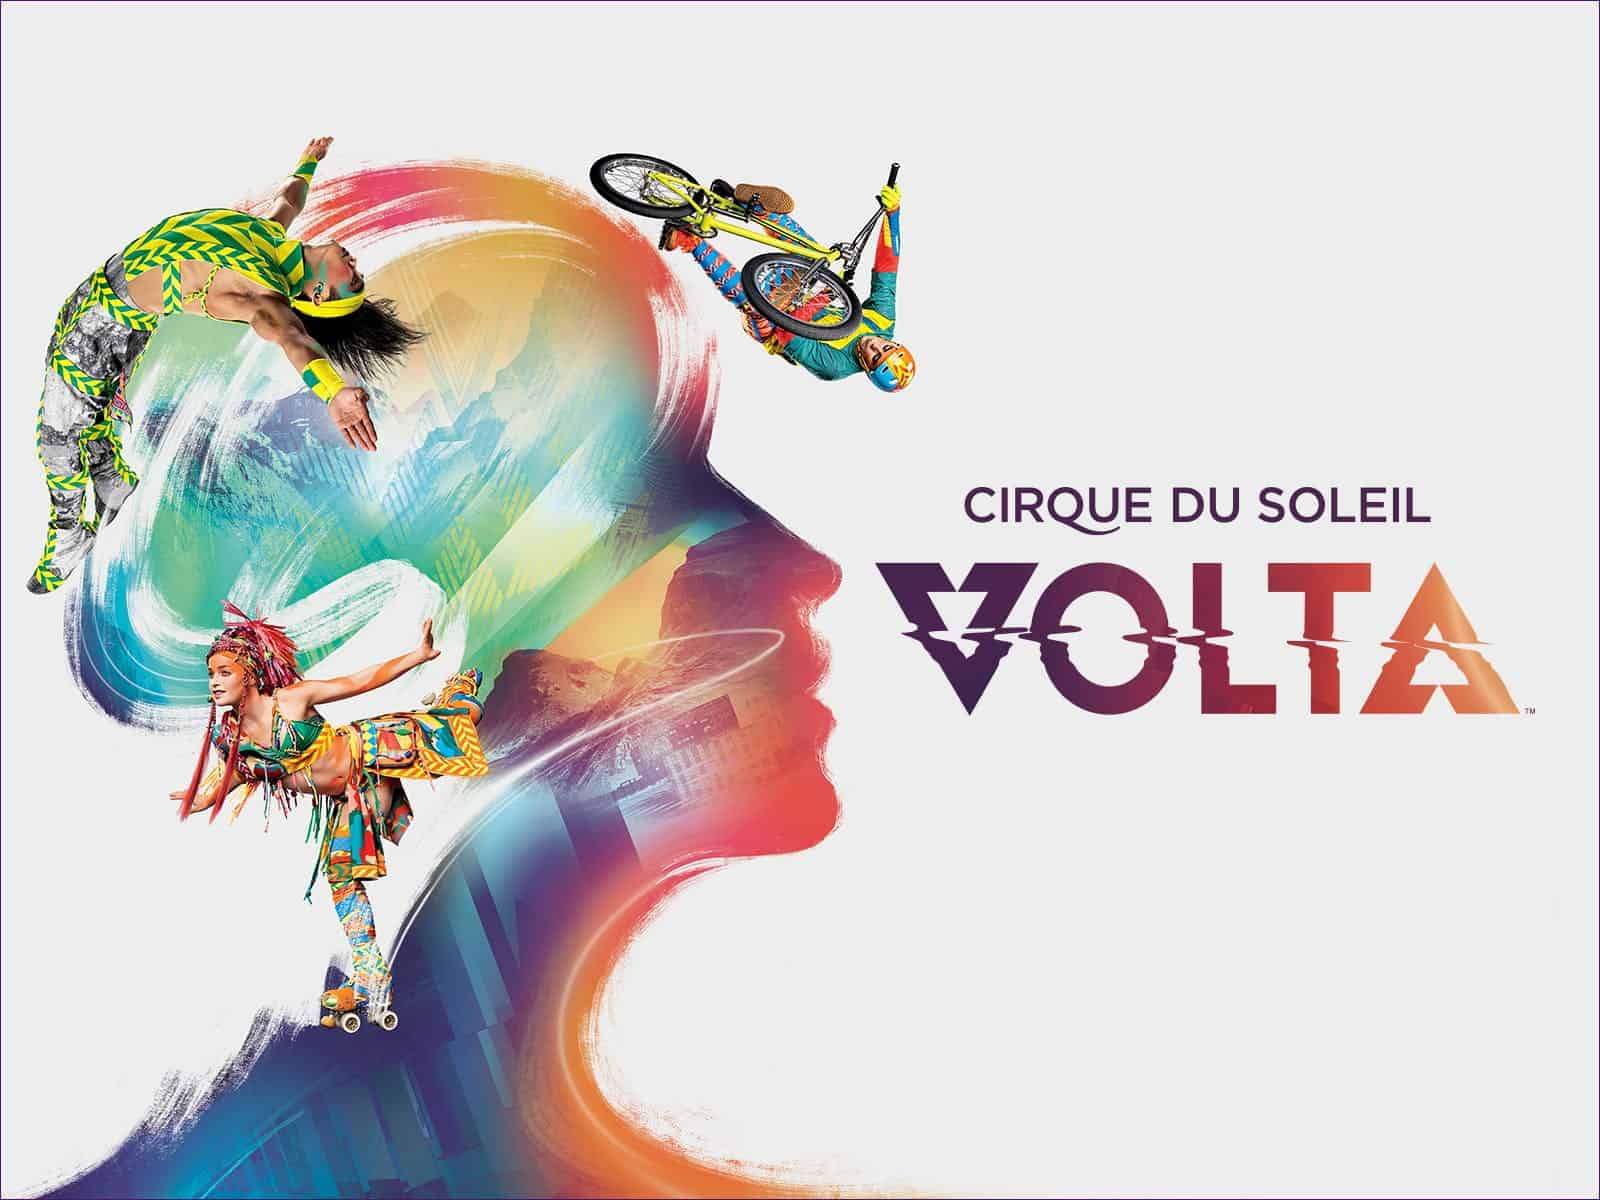 Arts preview: VOLTA by Cirque du Soleil